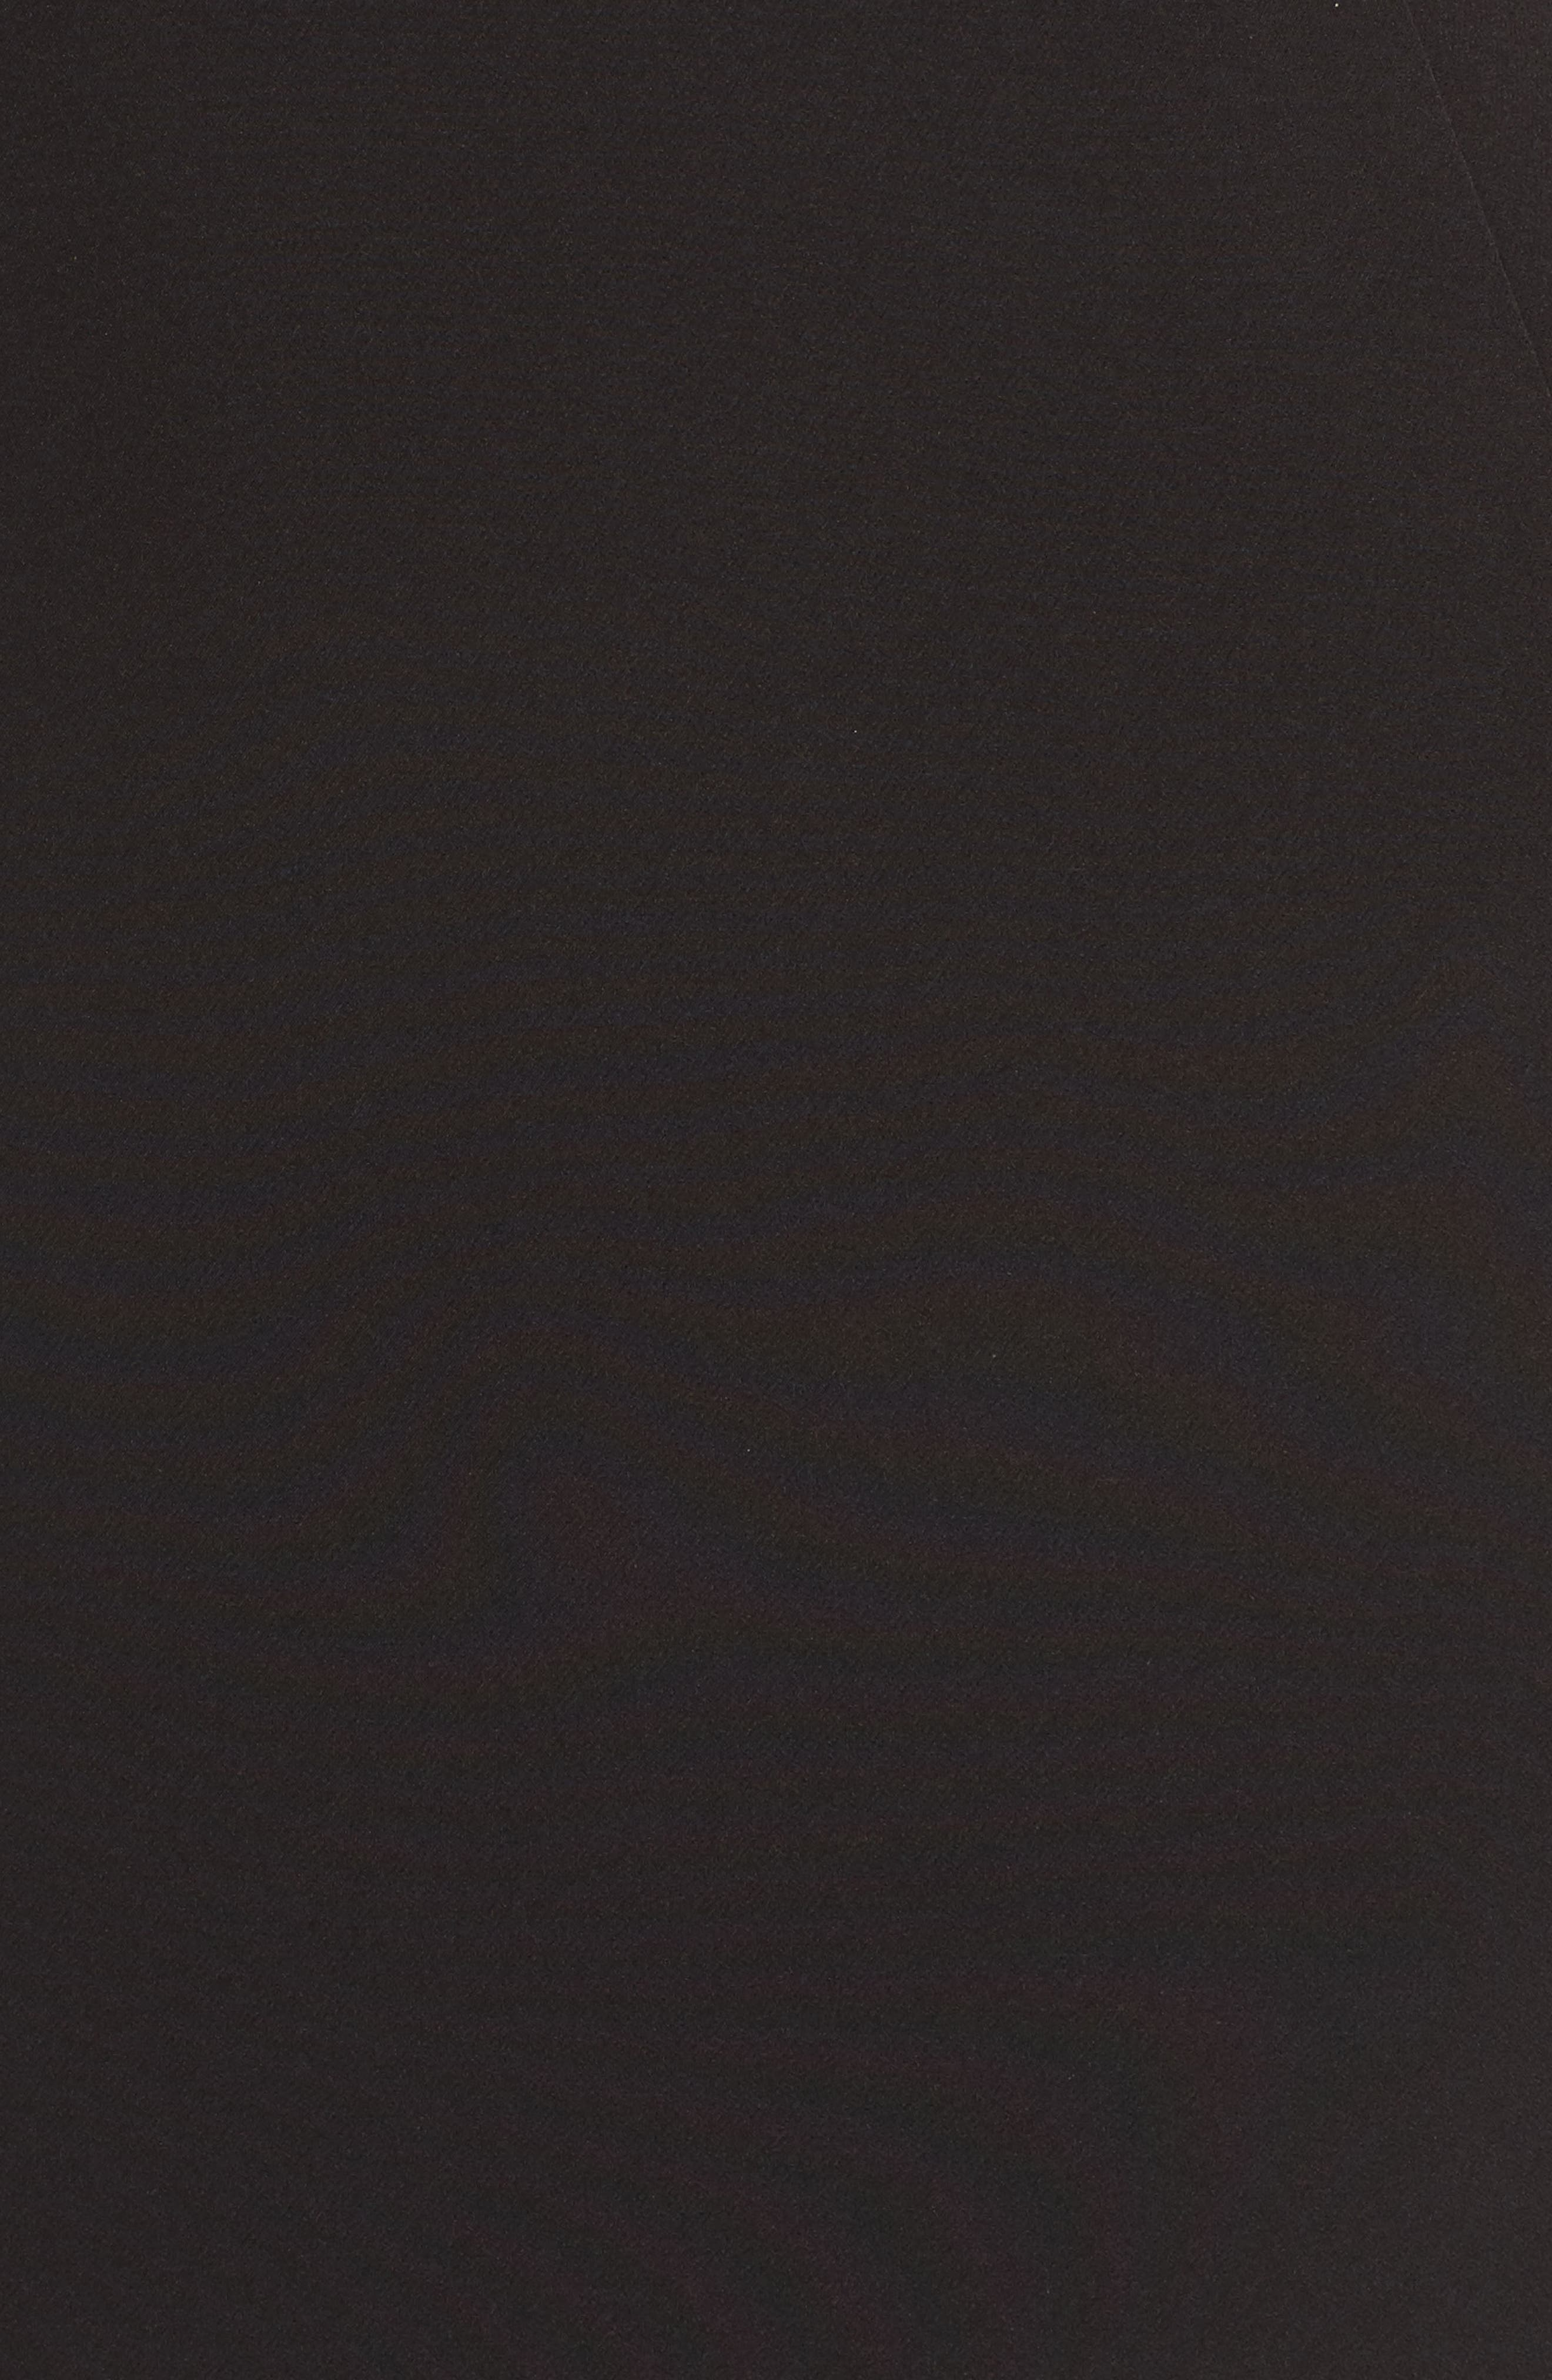 Ruffle Apron Detail Strapless Dress,                             Alternate thumbnail 6, color,                             Black